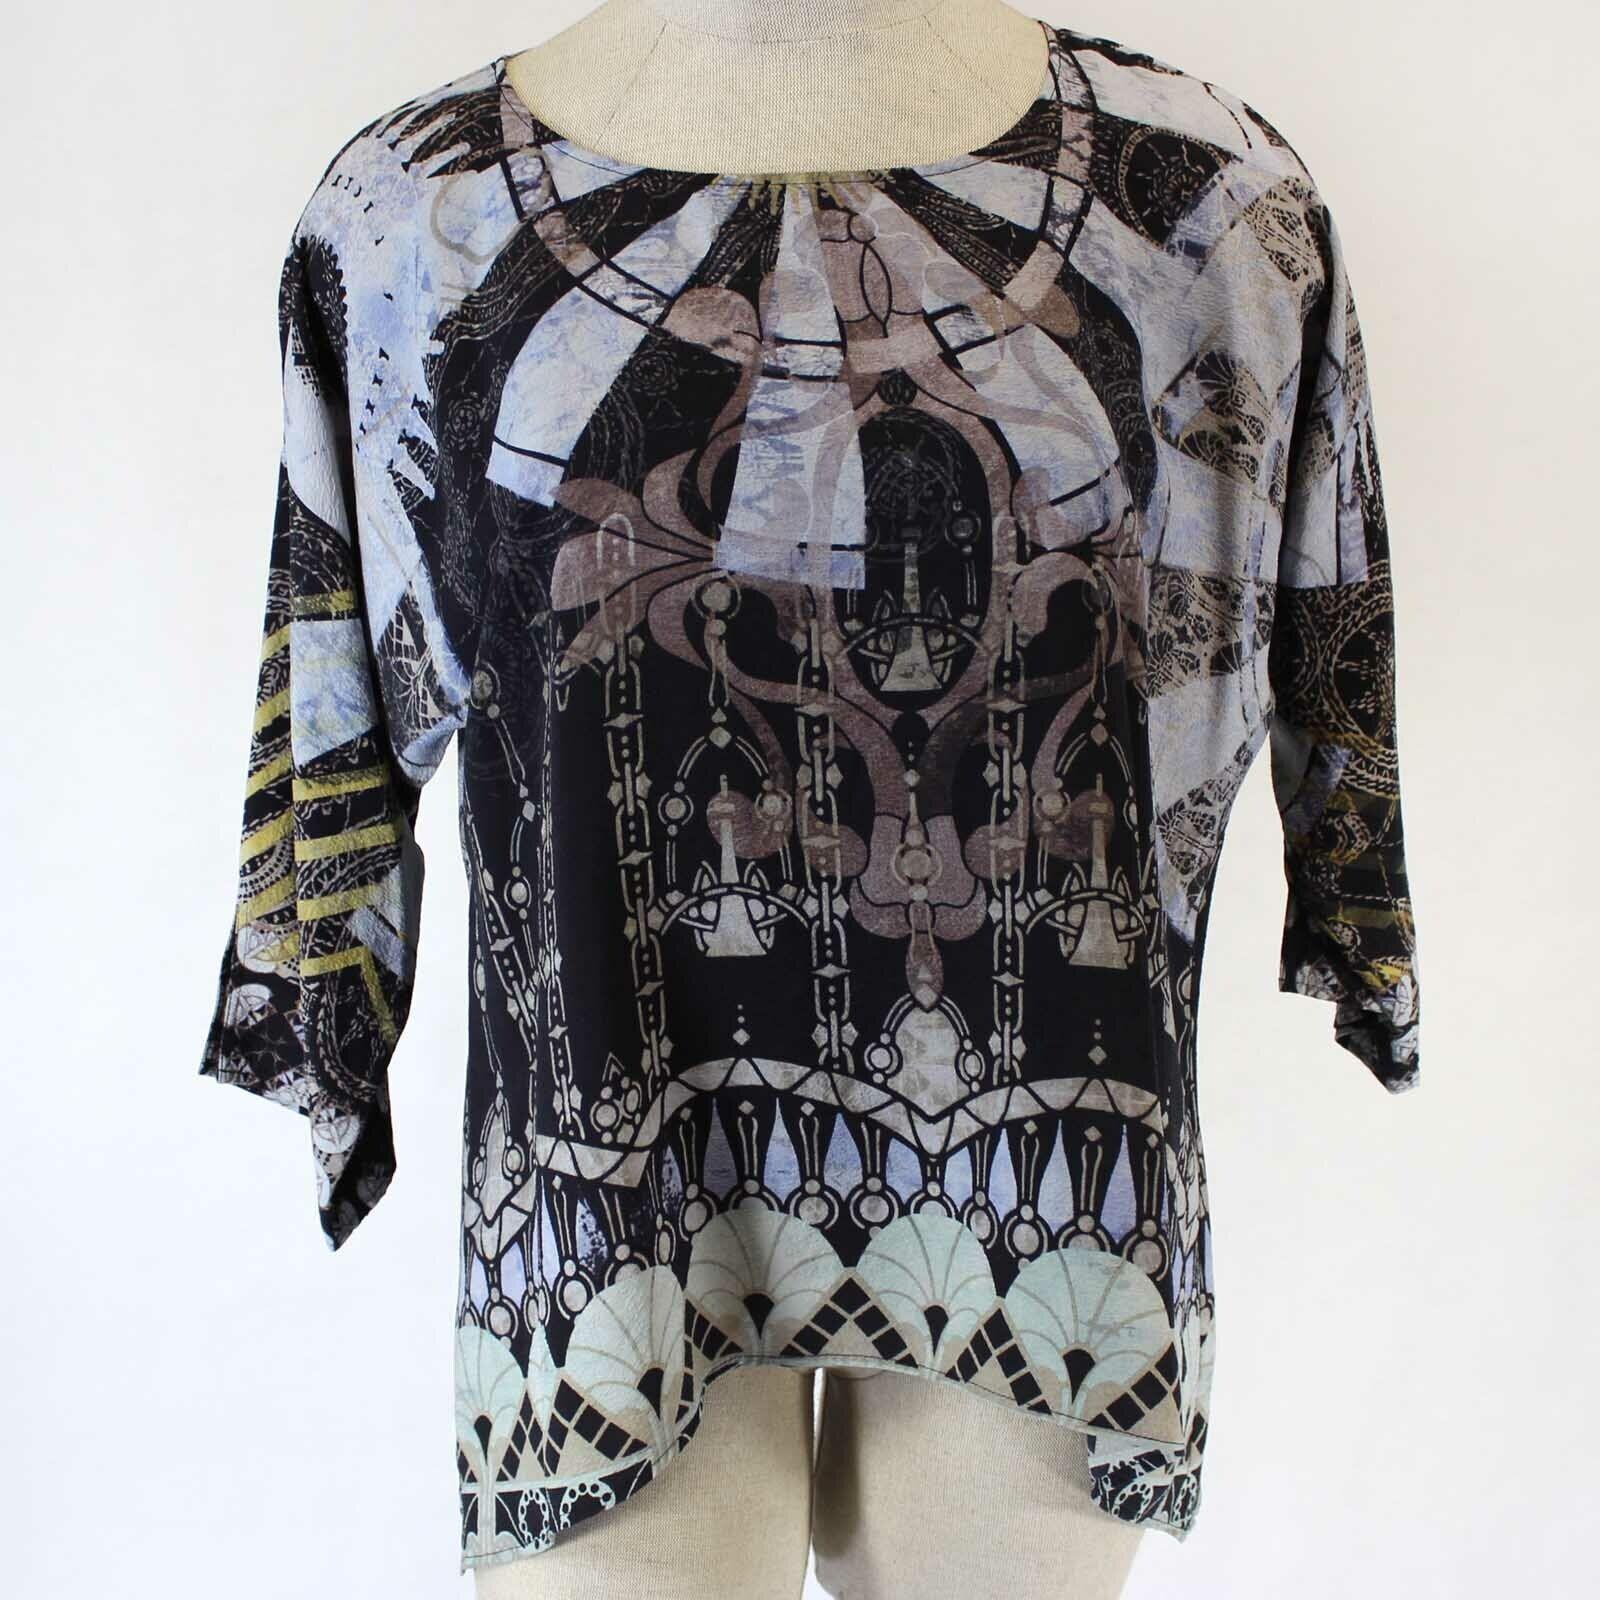 Citron Clothing 100% Silk Art To Wear Geometric Print Blouse Plus XL